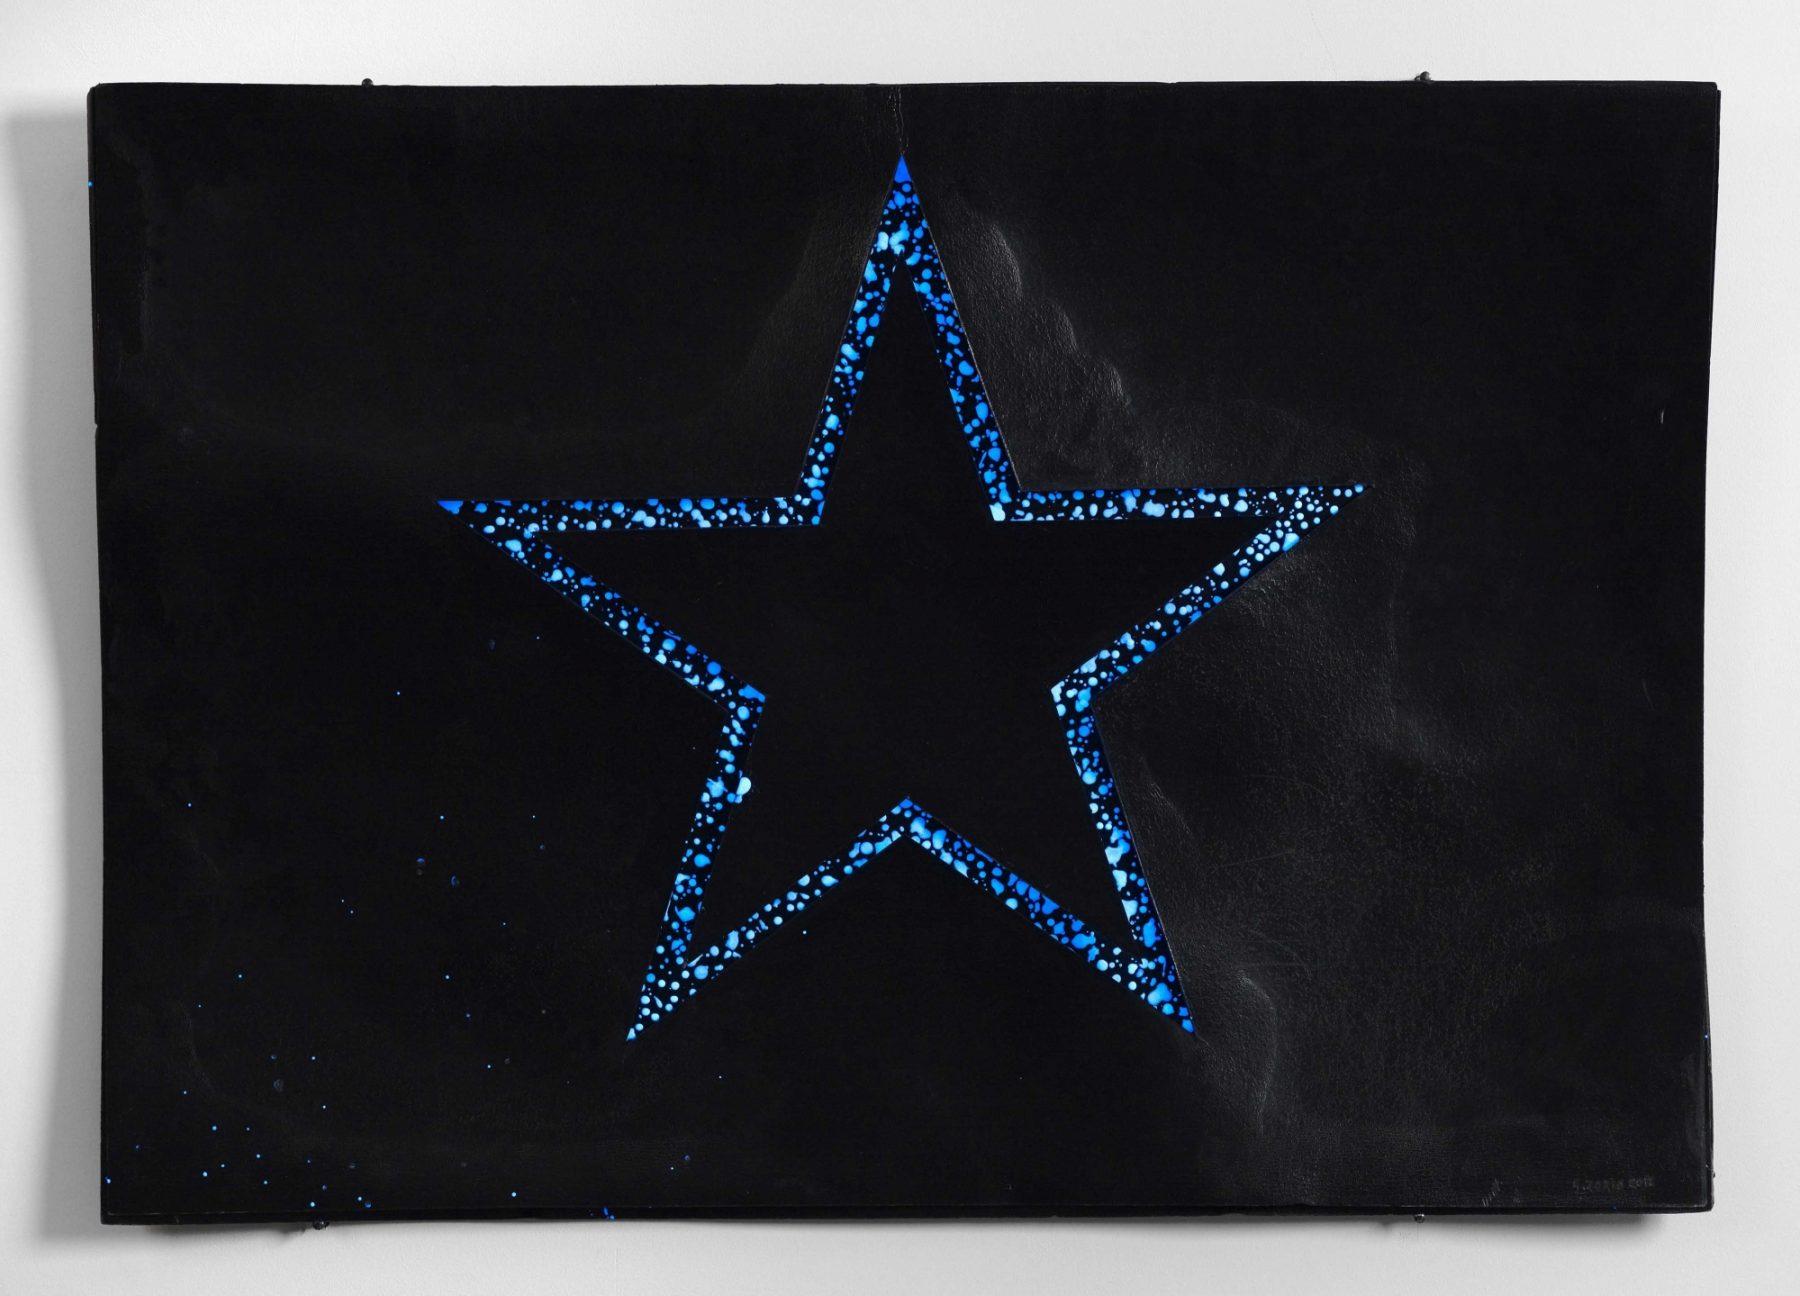 Stella sul nero (Star on Black)